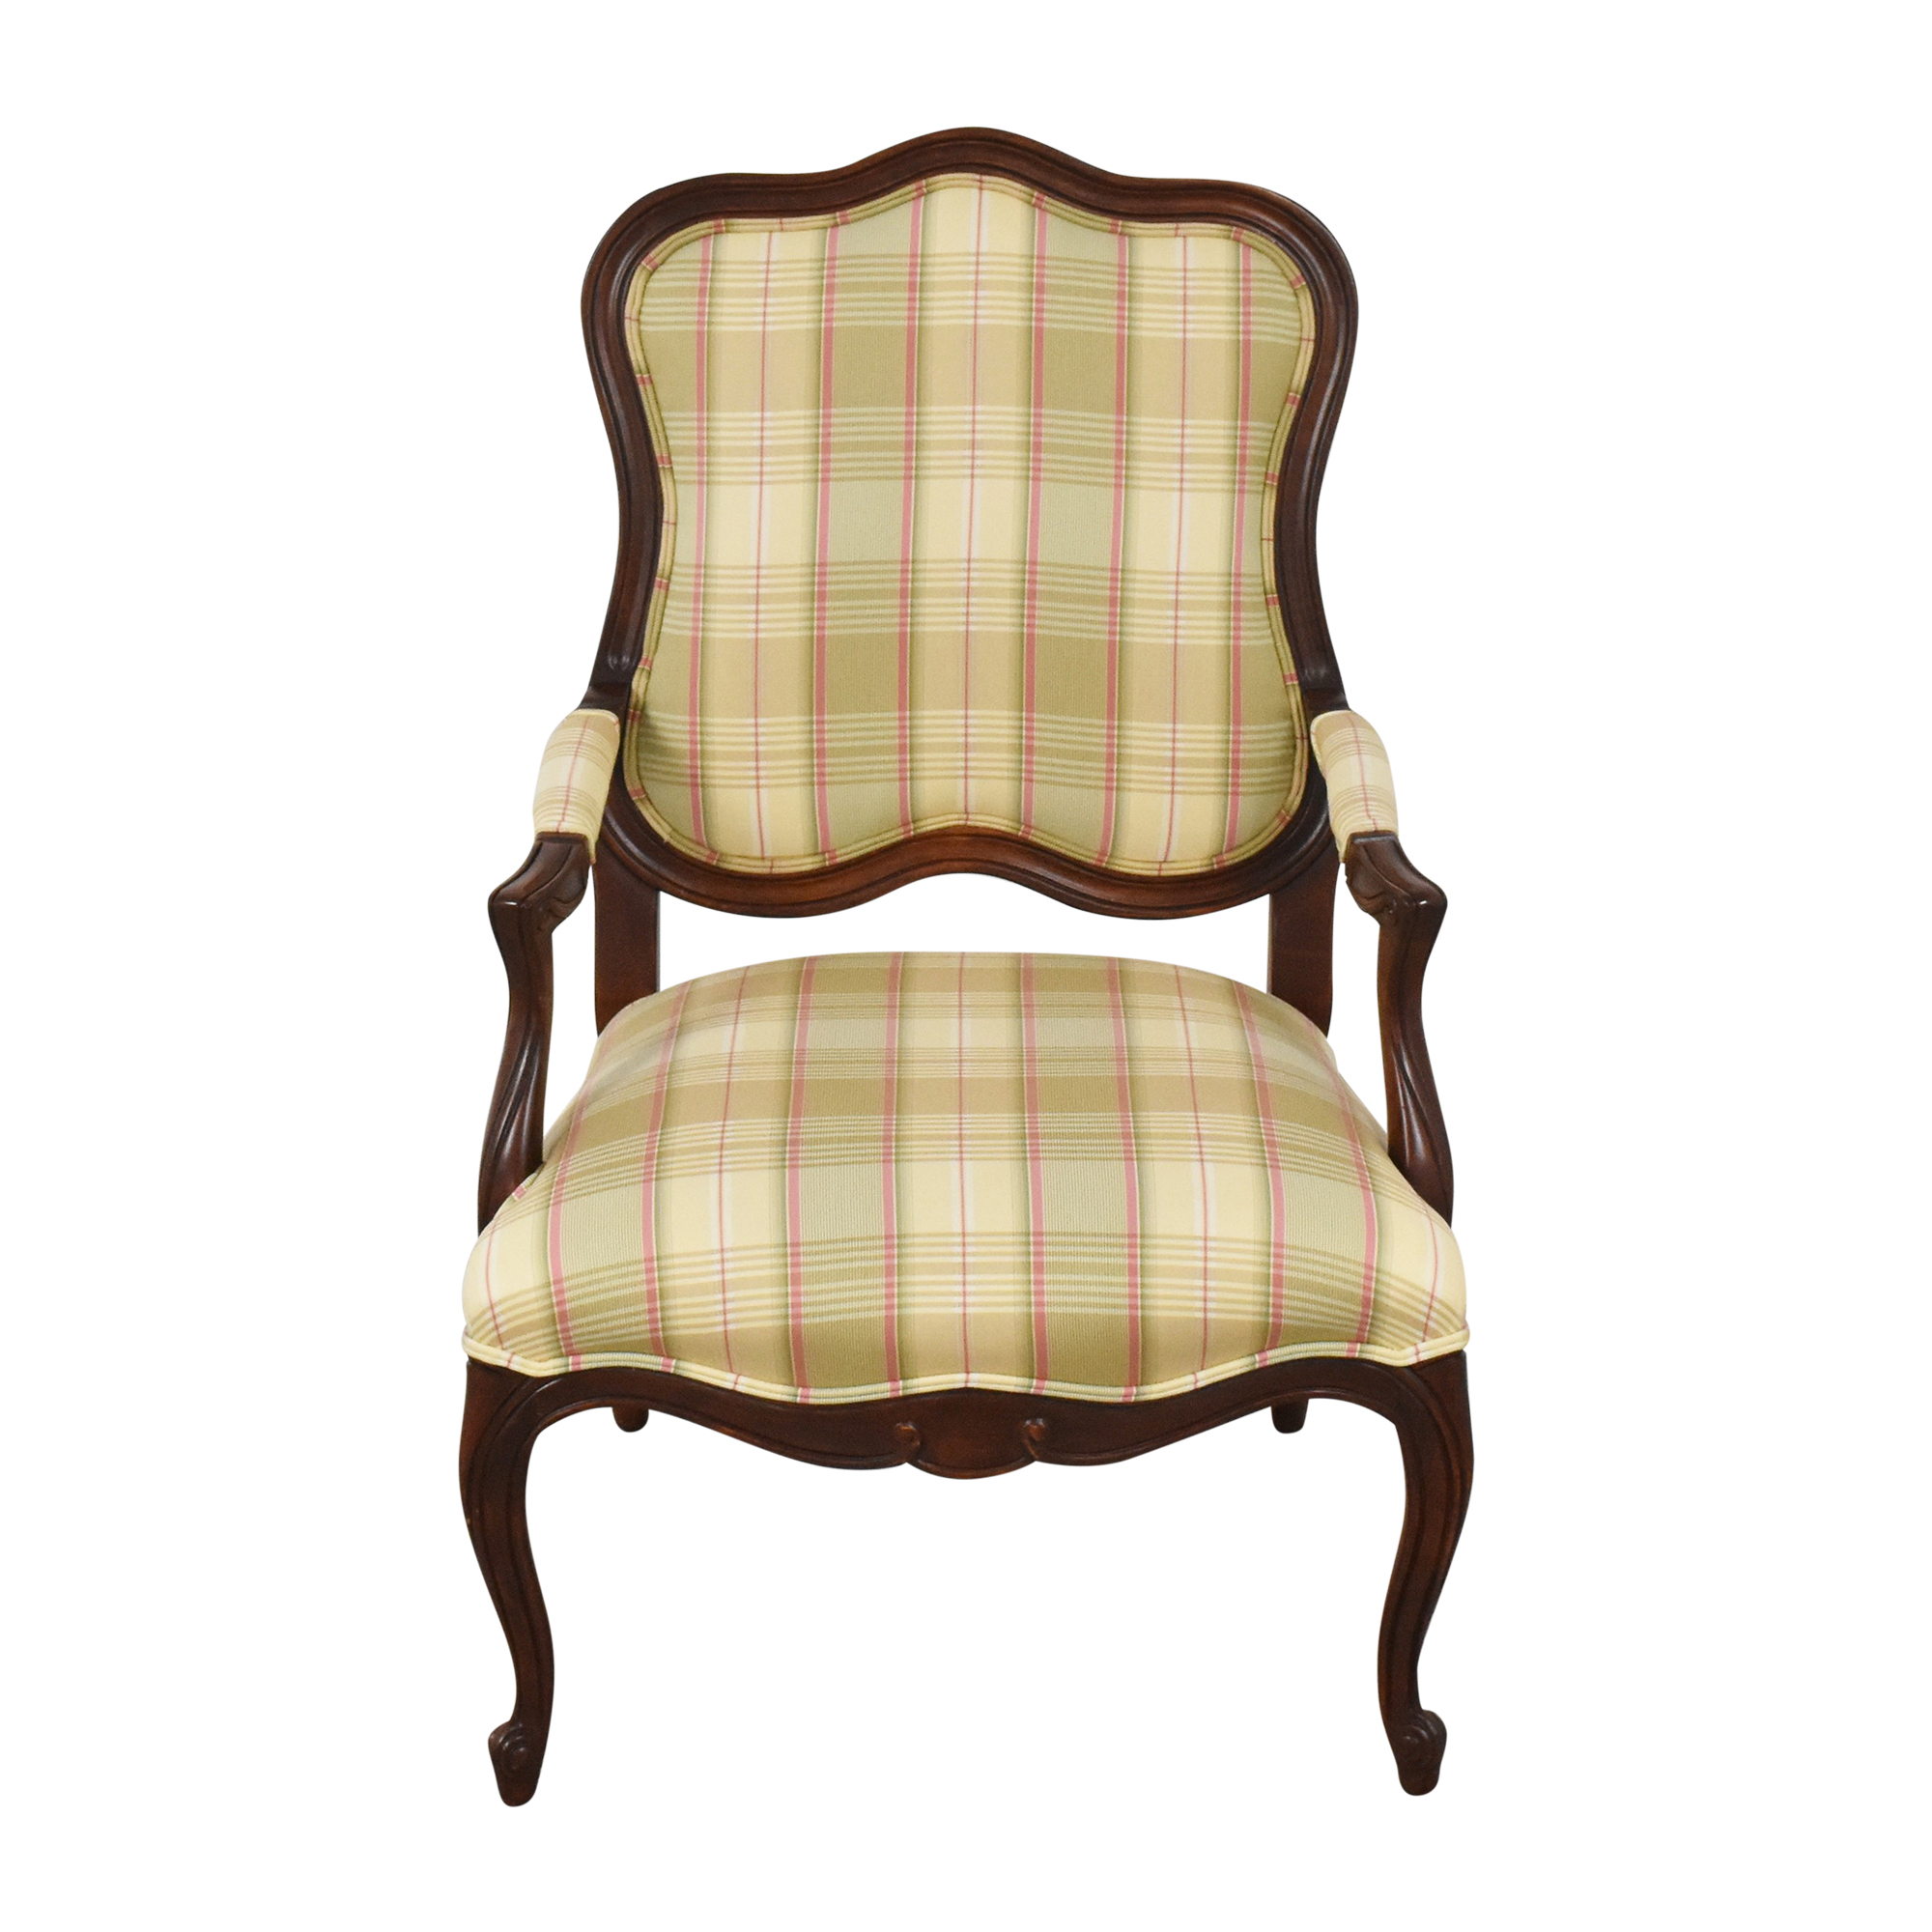 Ethan Allen Chantel Chair / Chairs